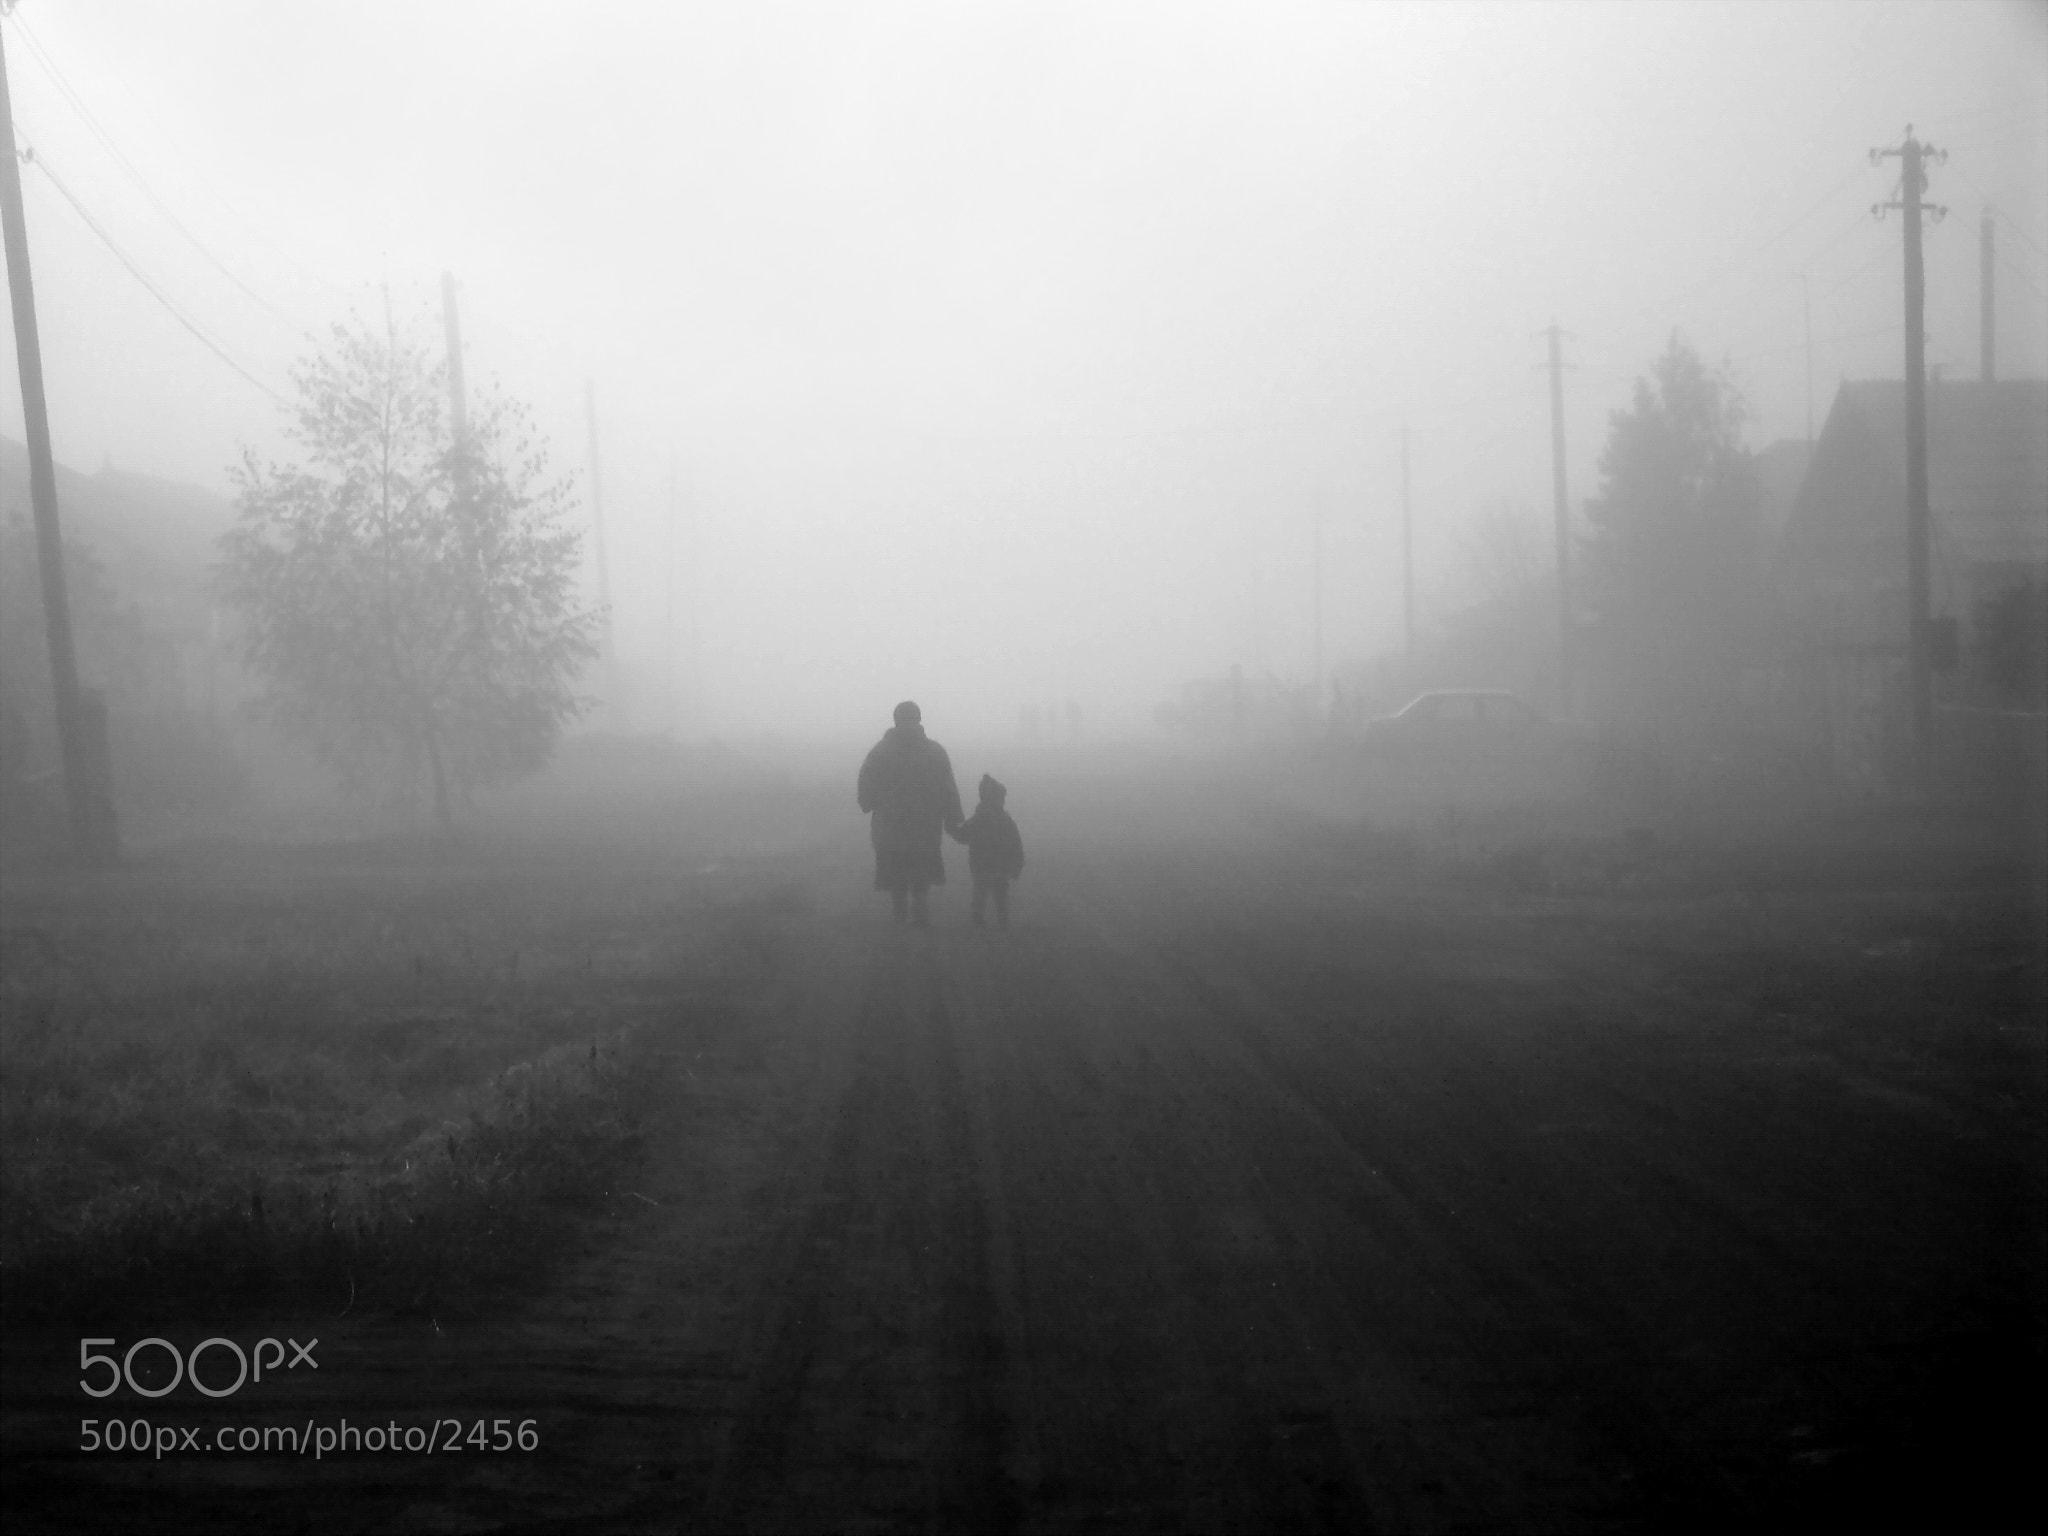 Photograph Туманное осеннее утро by Aleksey Panko on 500px